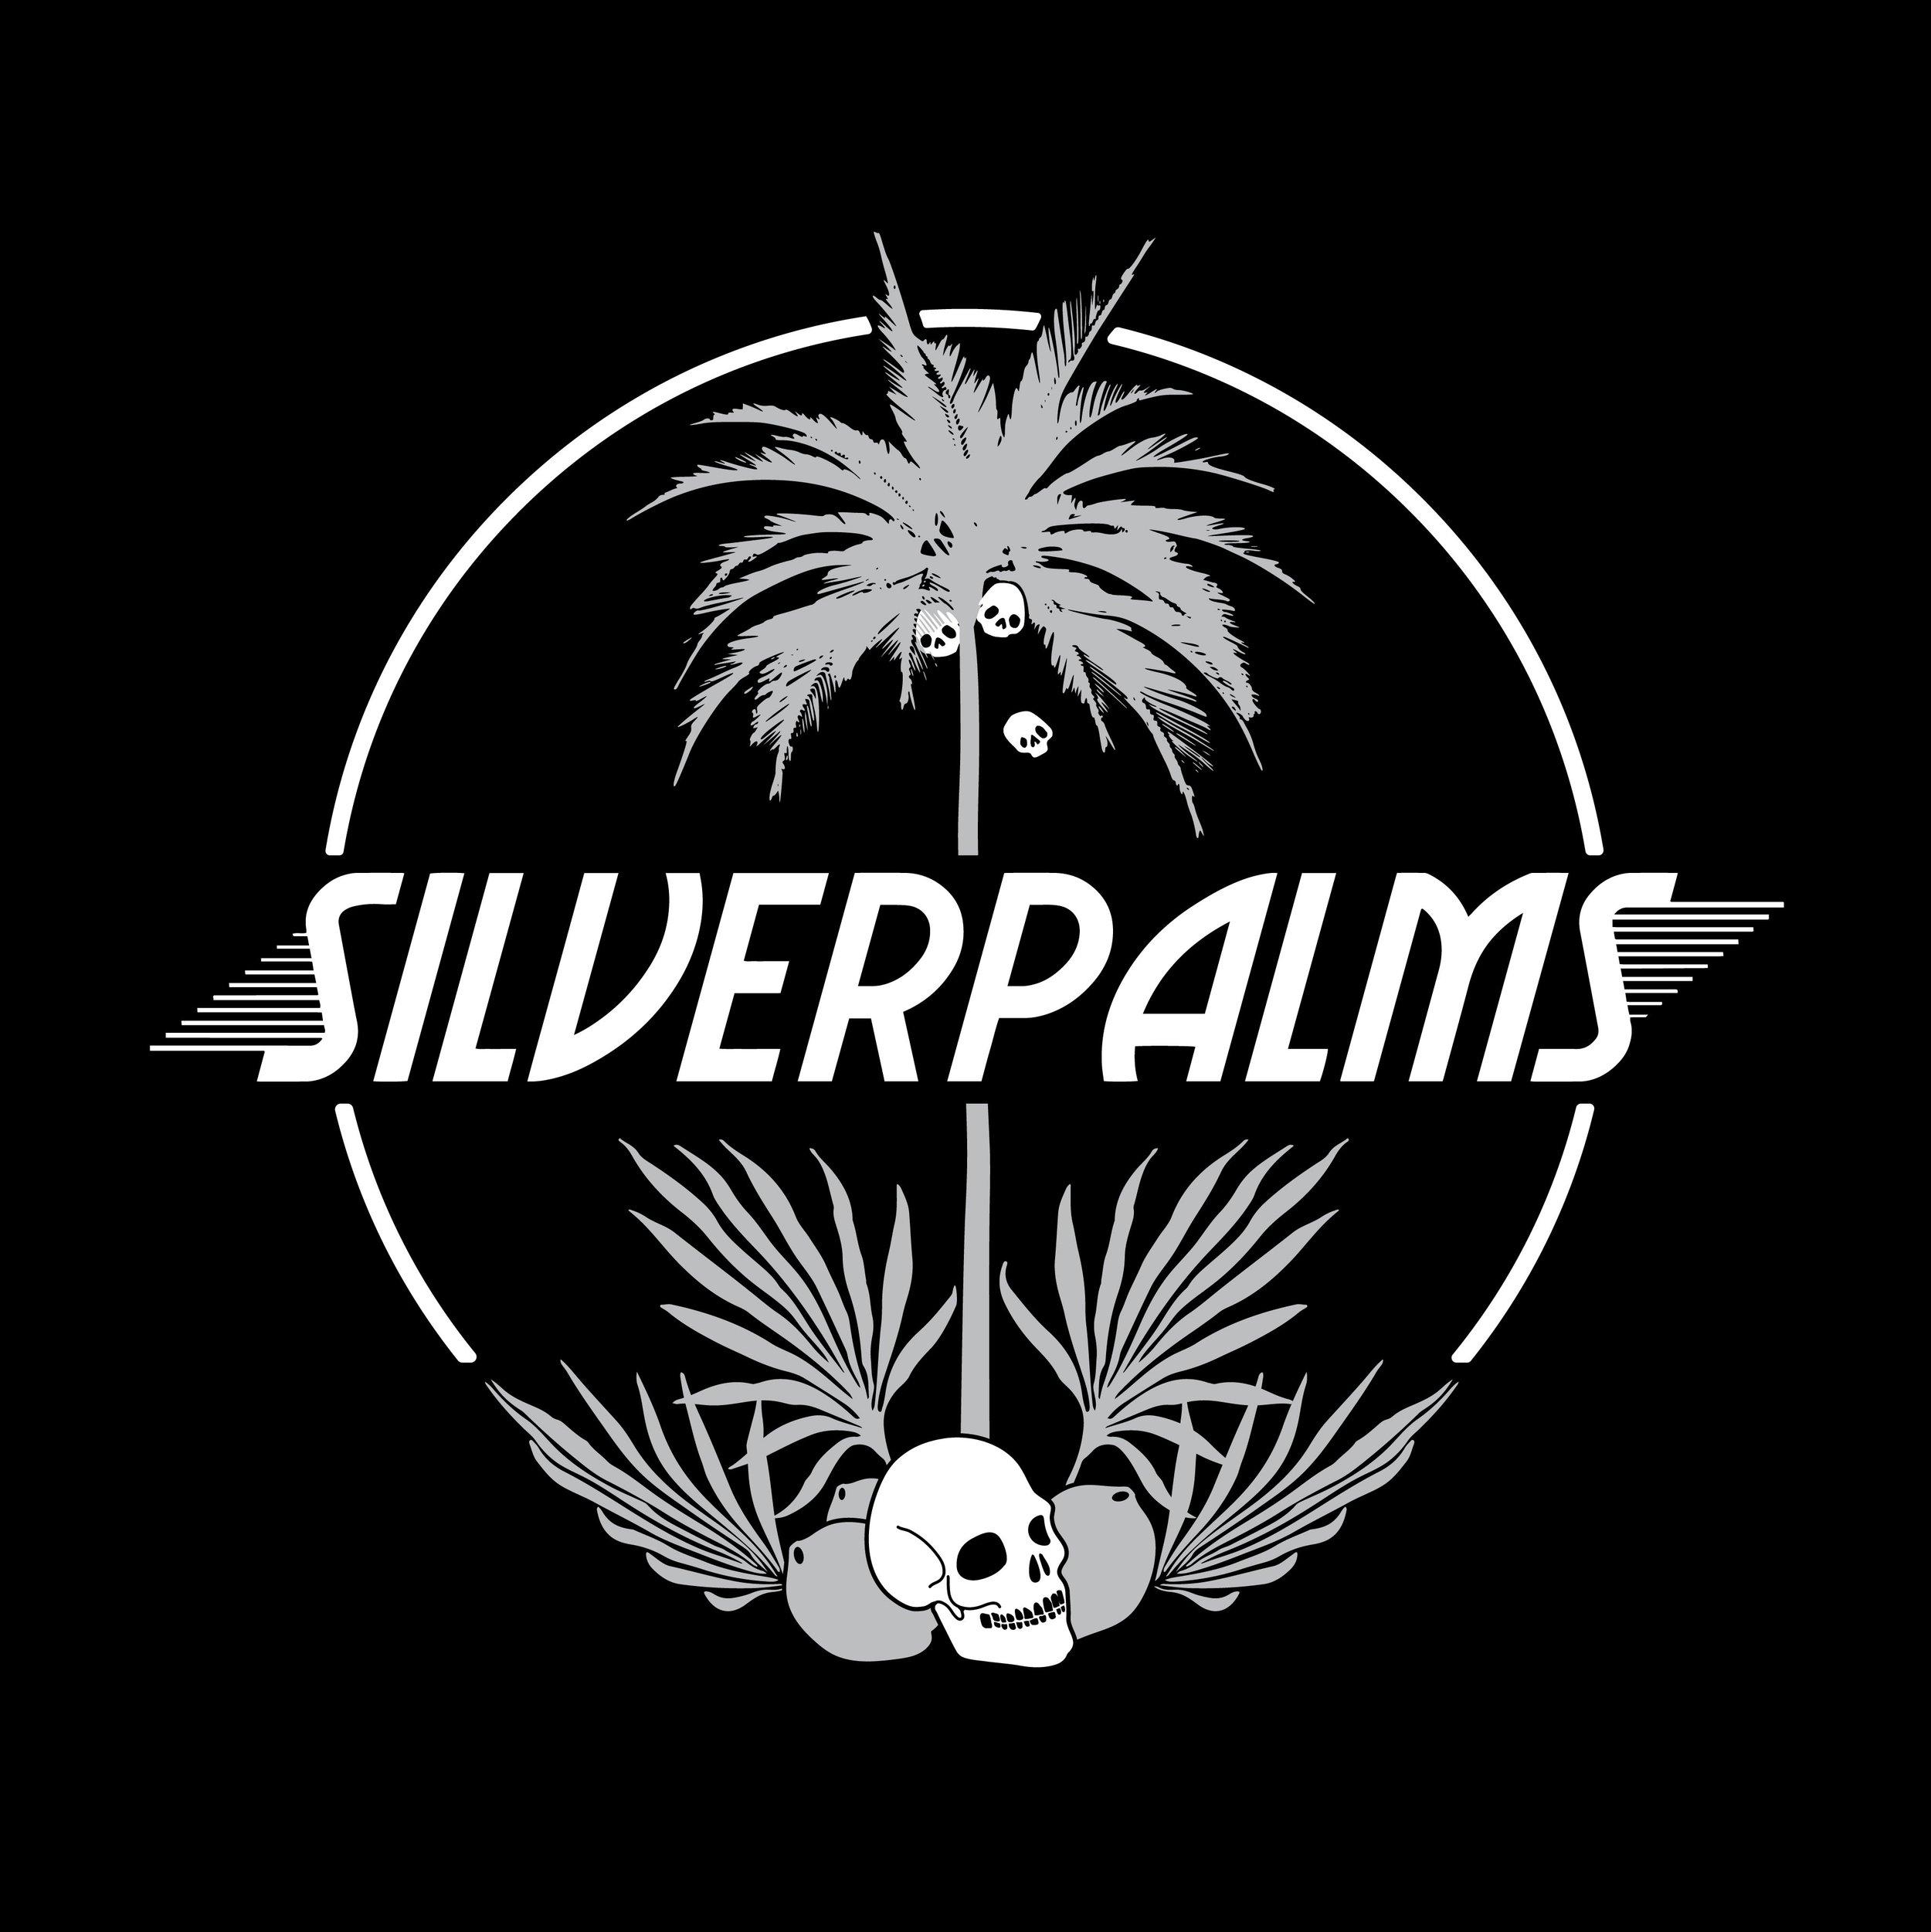 Silverpalms Band